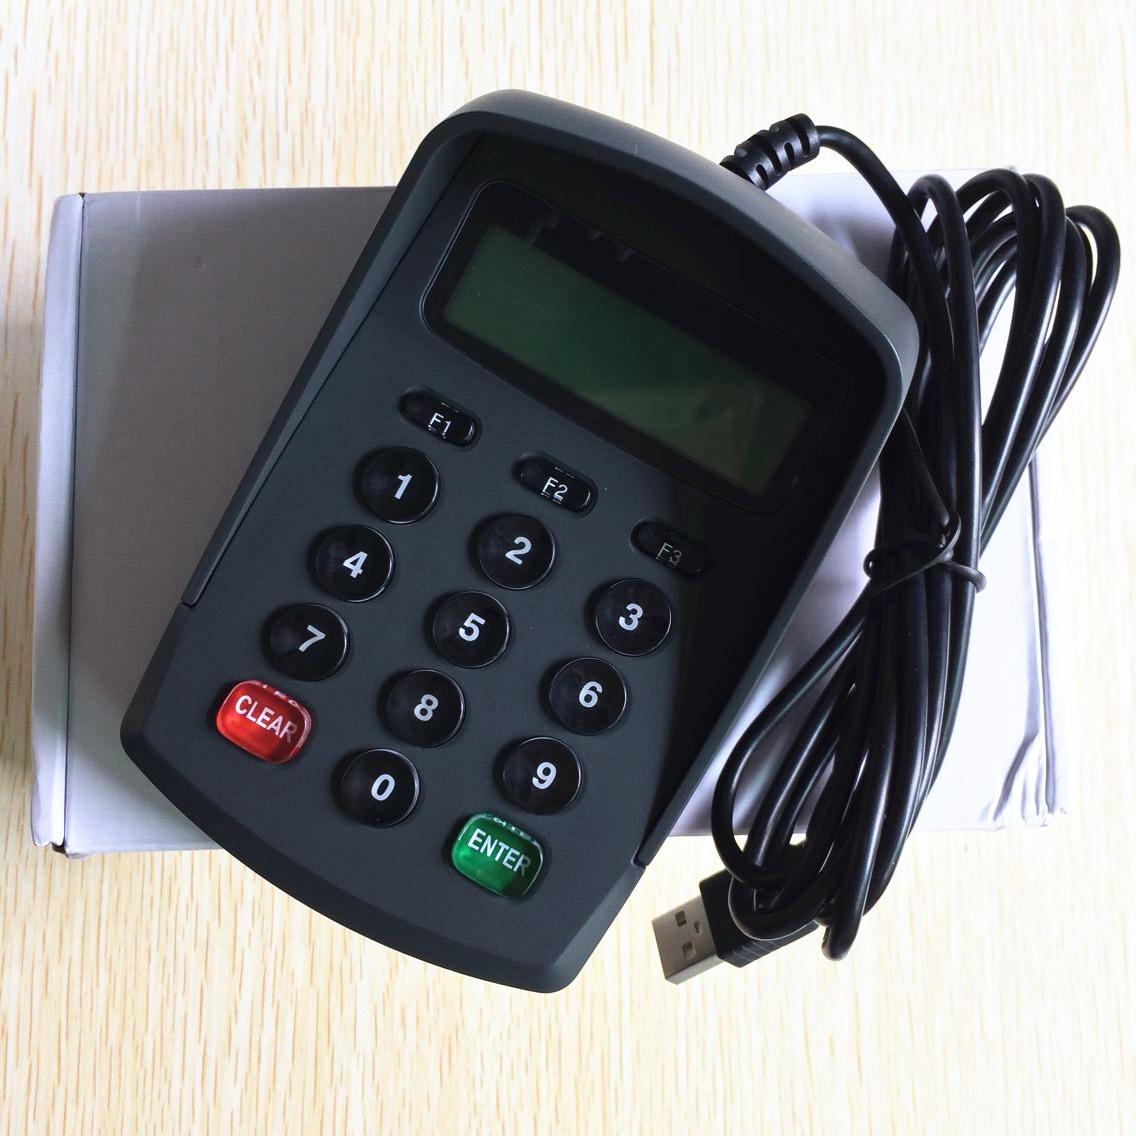 USB Emulator RS232 Interface 15 Keys with LCD Pin Pad /Password Keyboard YD531